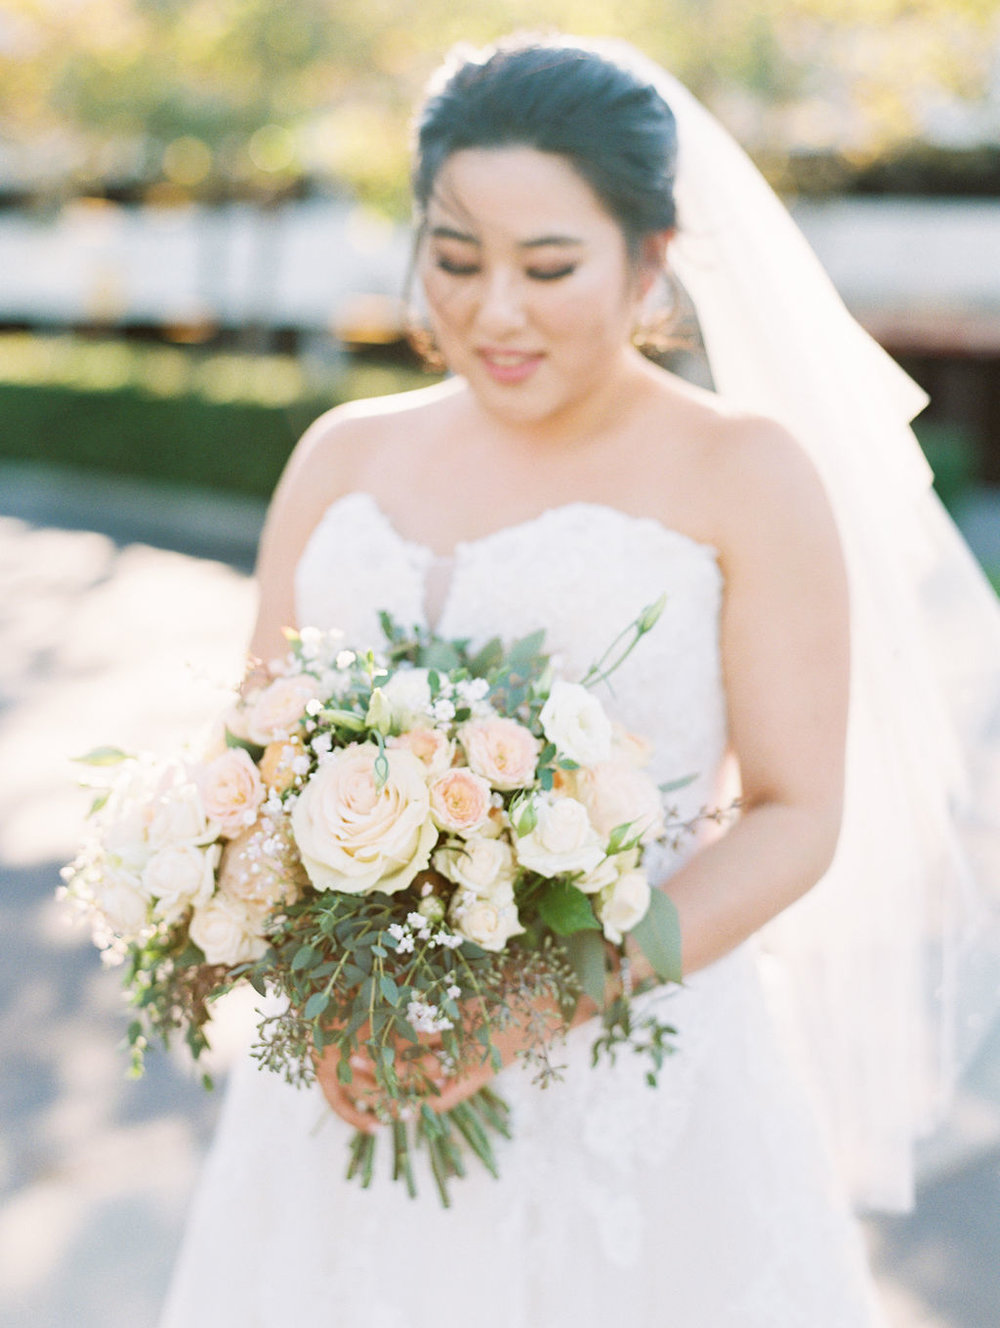 JennySoiPhotography-S&SSFAirportWeddingBrideandGroom-116.jpgSan Francisco Fairmont Hotel Wedding Fine Art Film Wedding Photographer